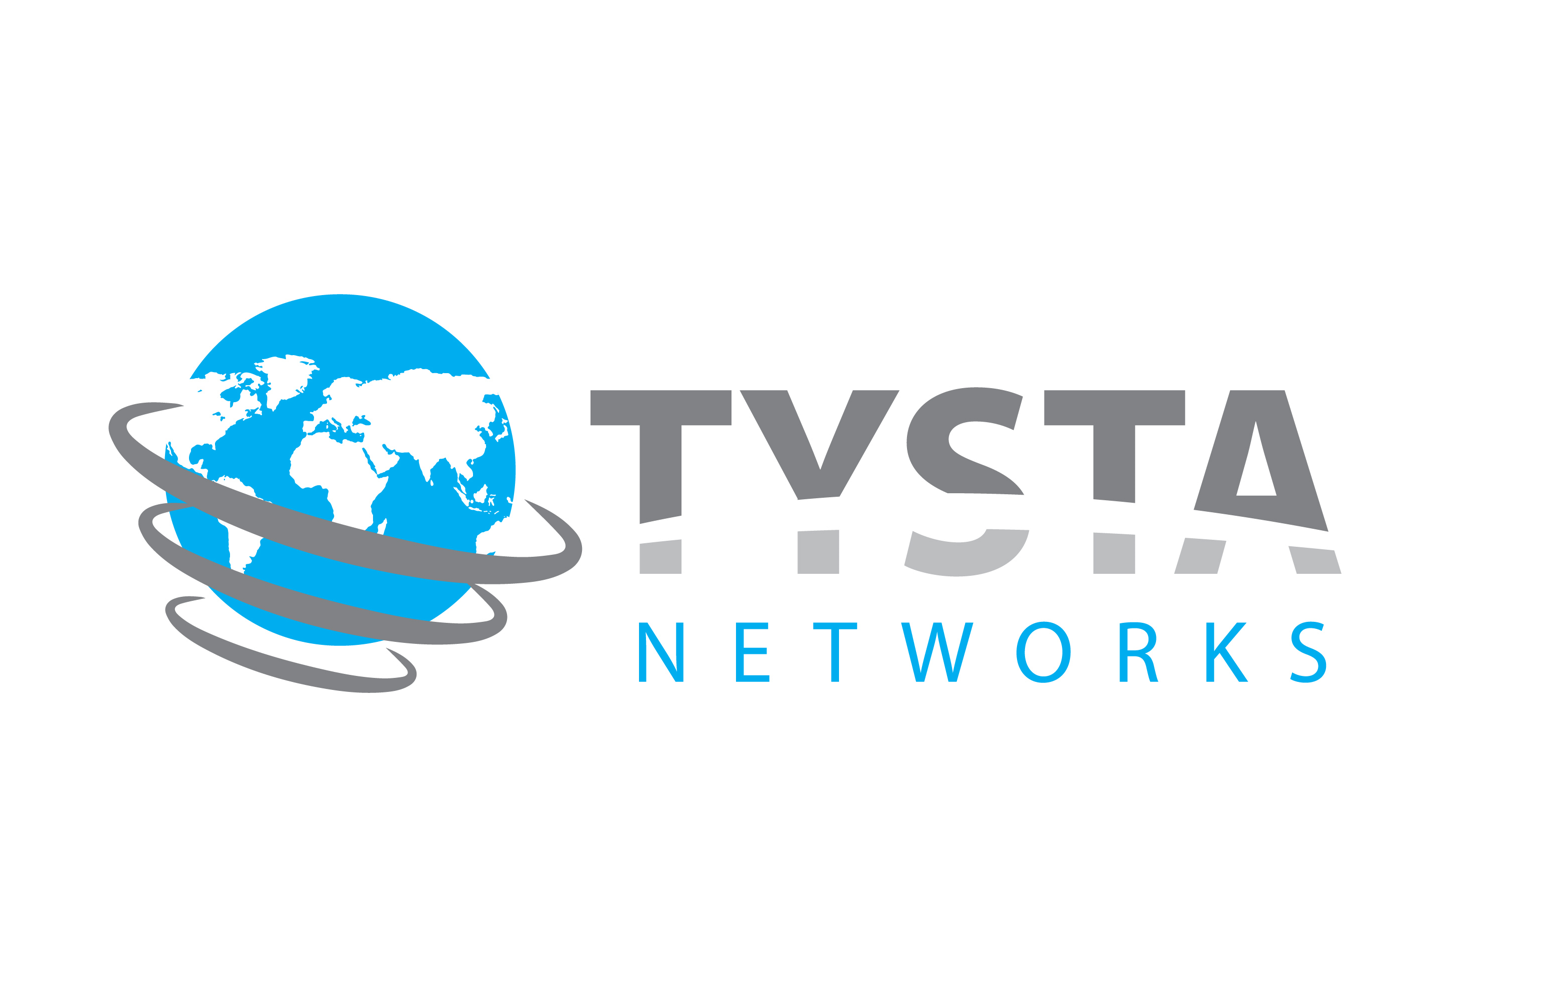 TYSTA NETWORKS